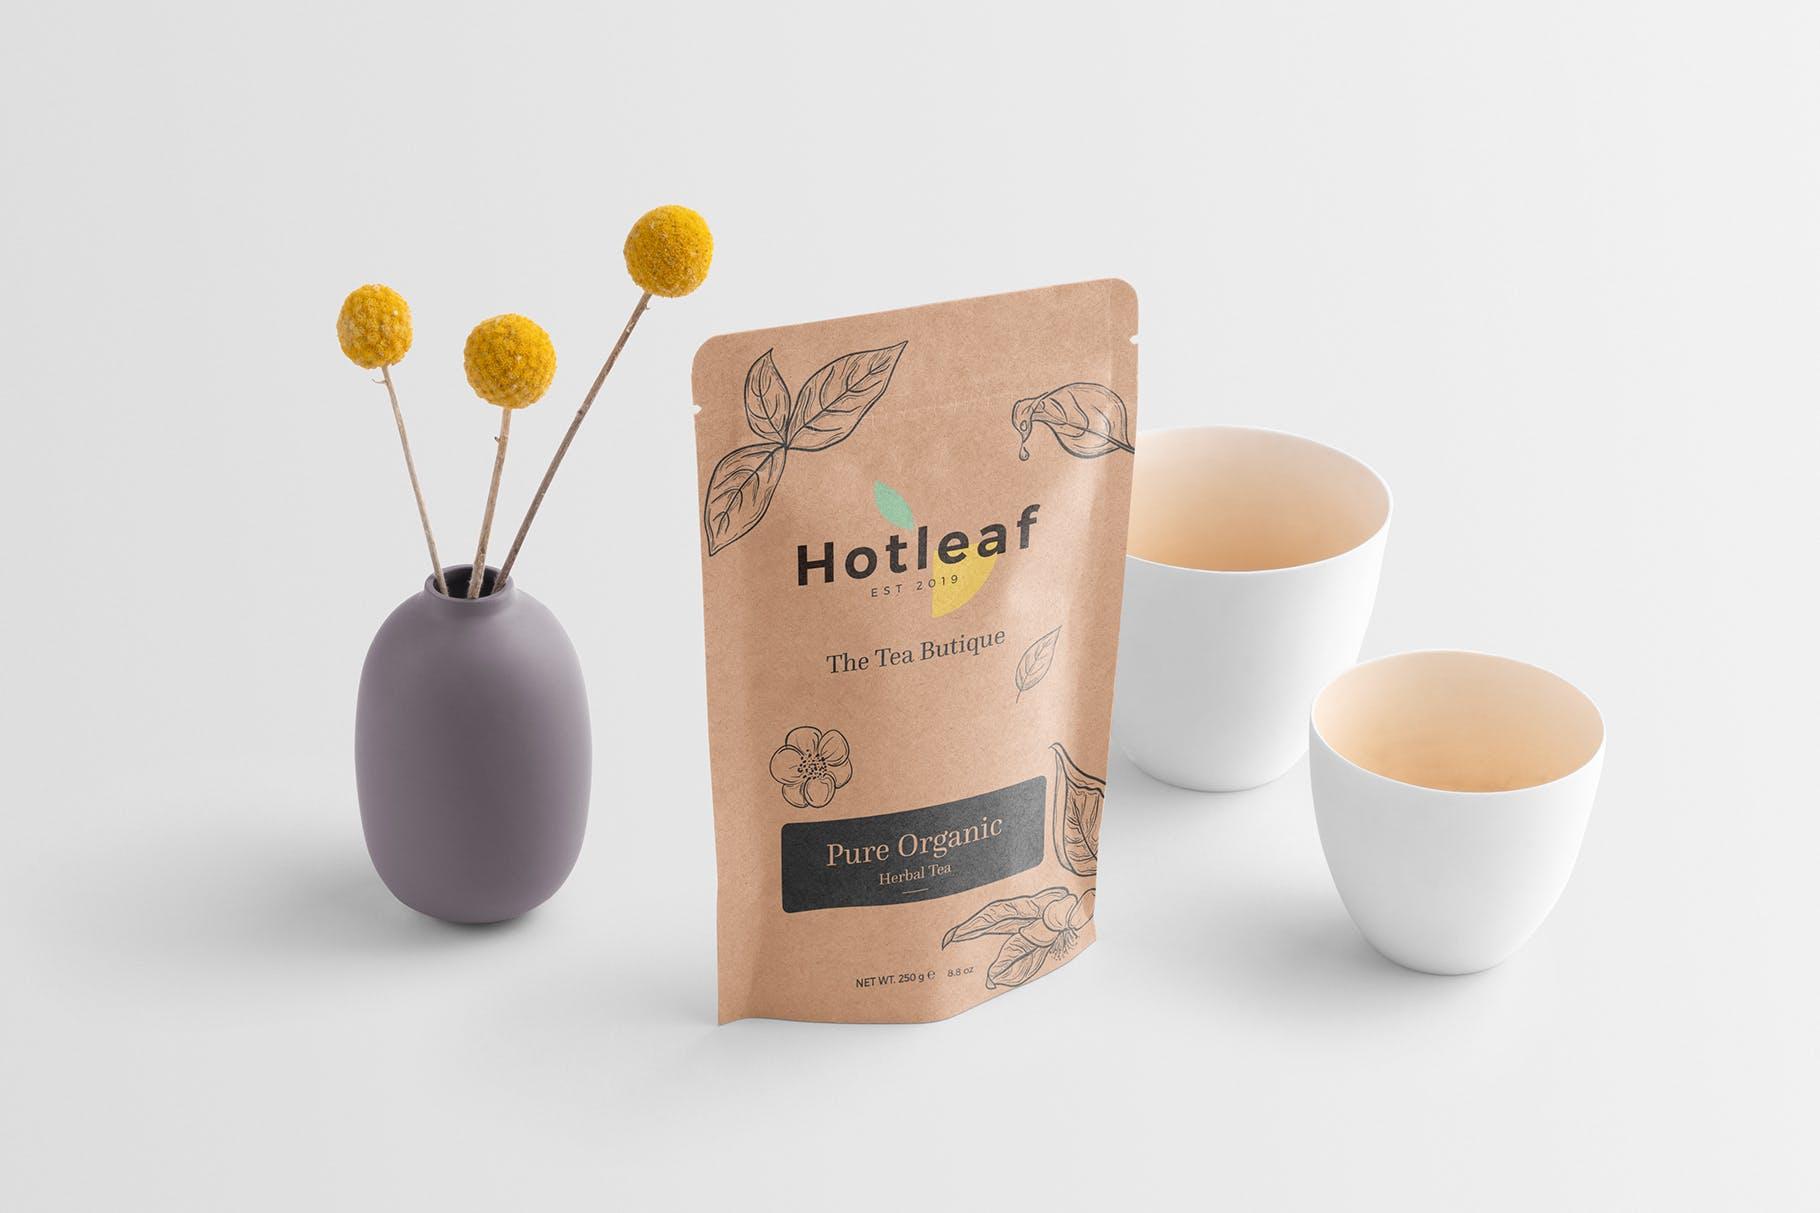 Hotleaf –茶馆品牌样机第1卷TUP6ELV插图(7)